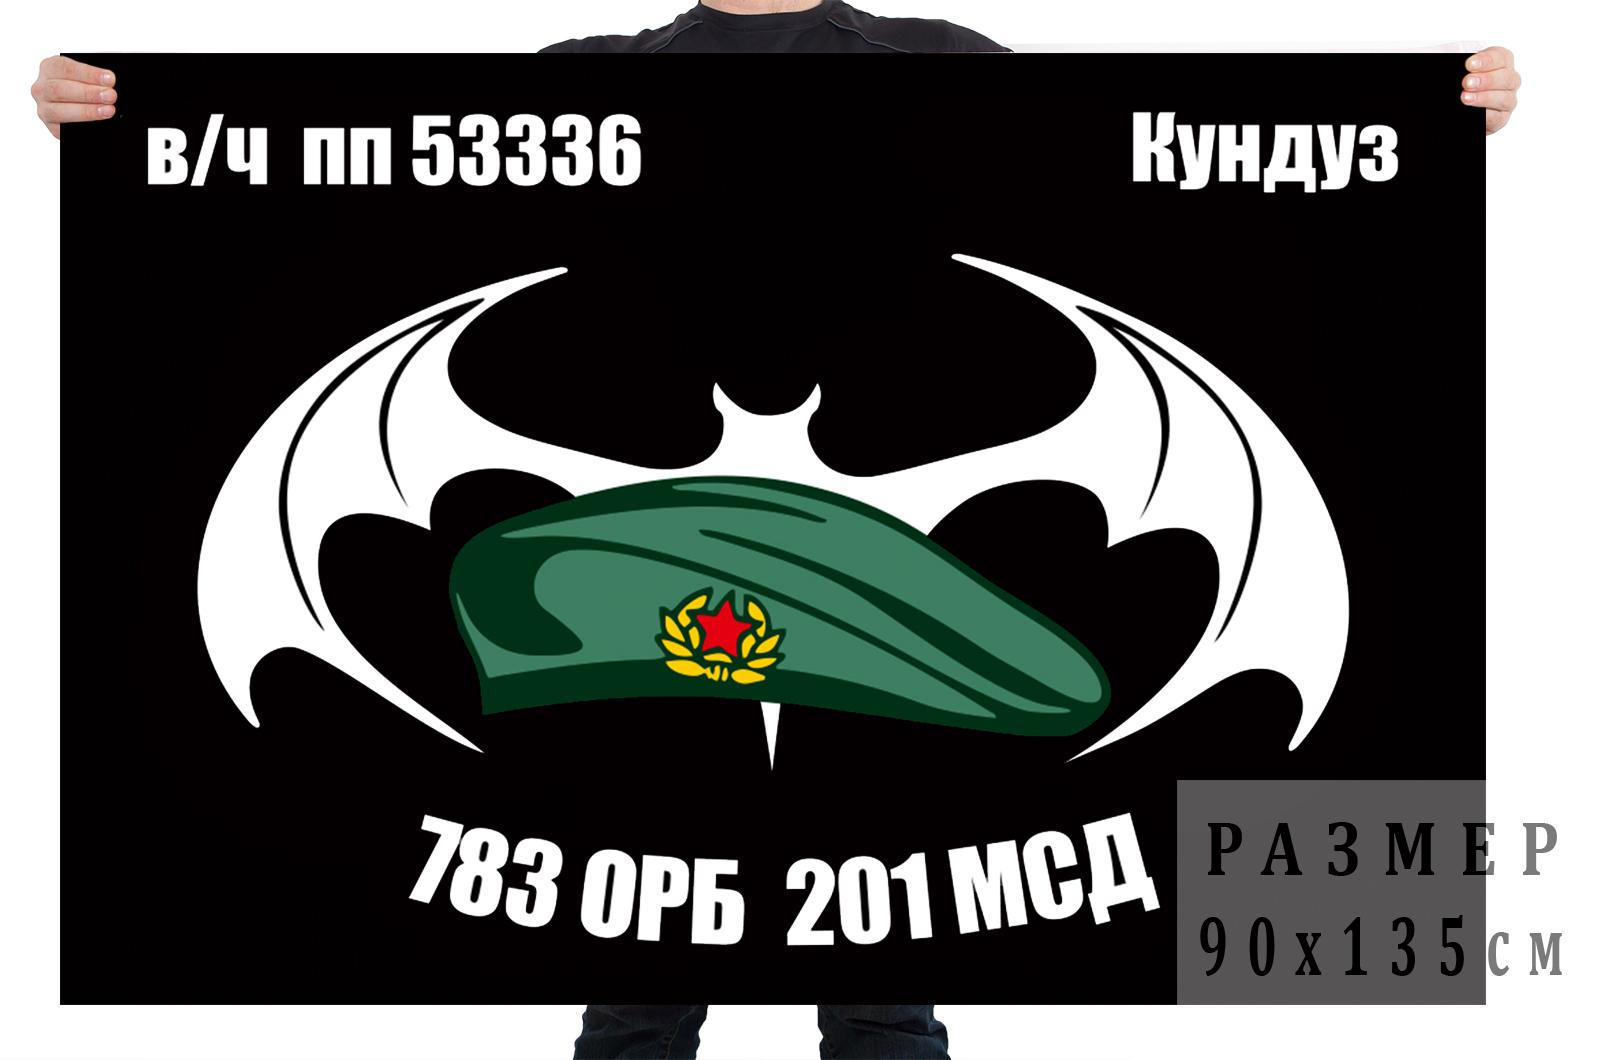 Флаг 783 ОРБ 201 МСД в Афганистане